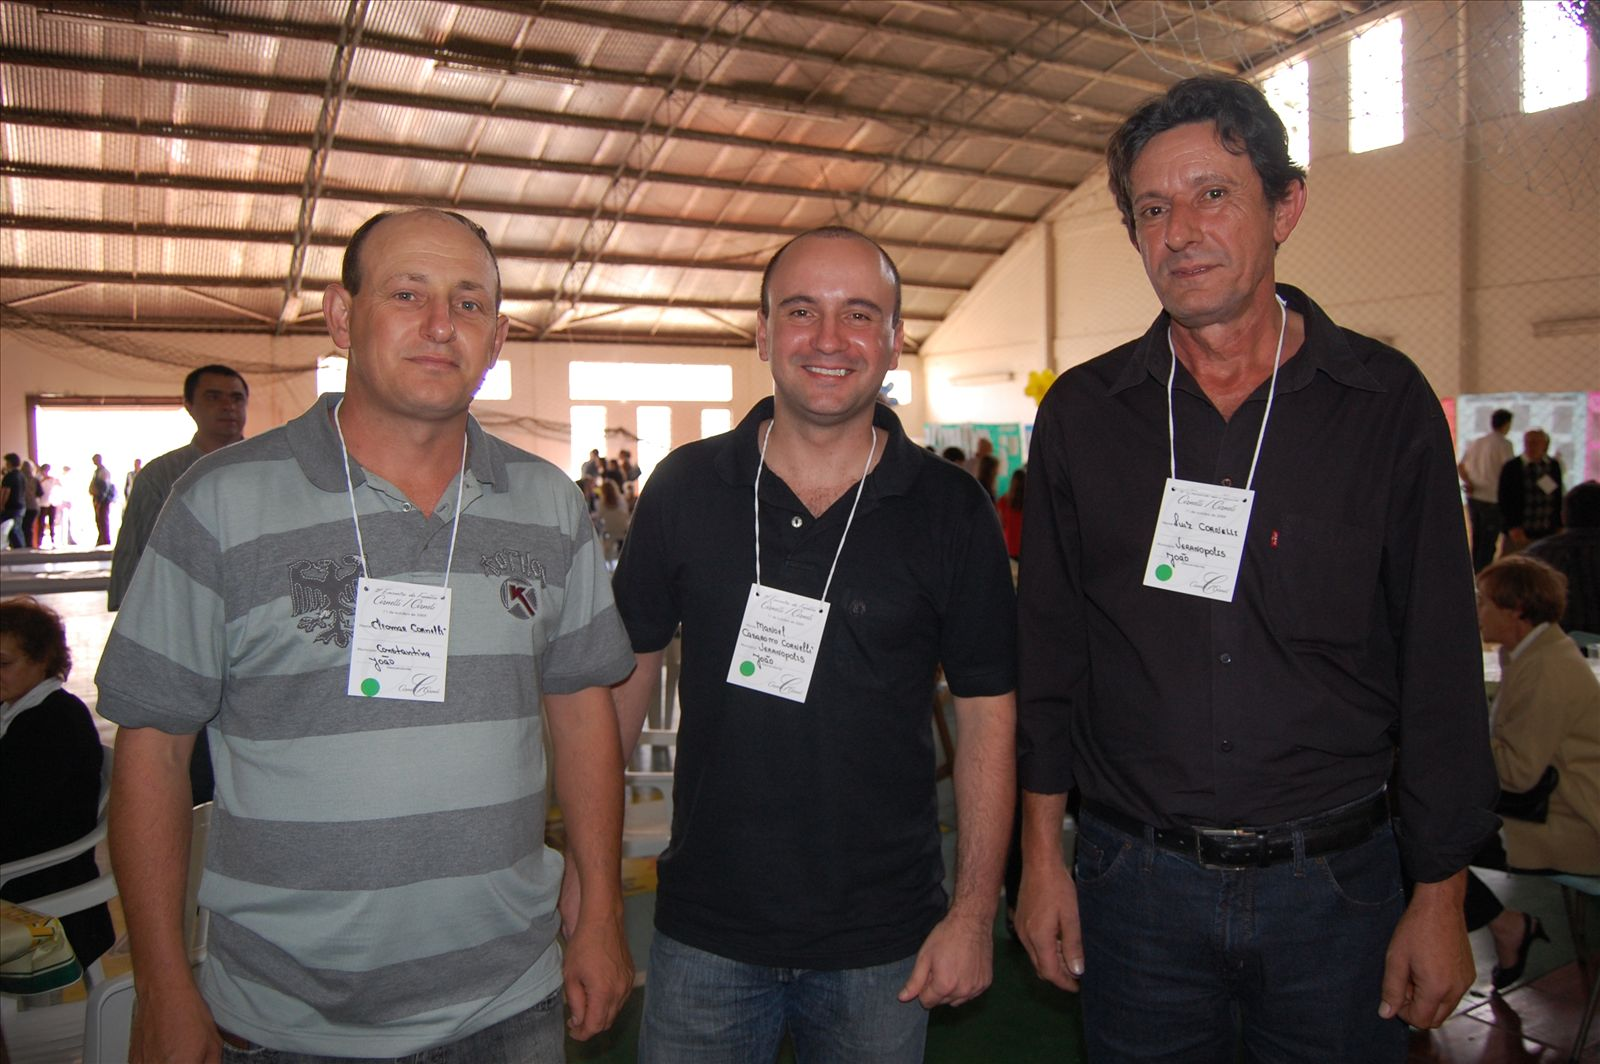 2º Encontro Família Cornelli - 11.10.2009 (40)_0